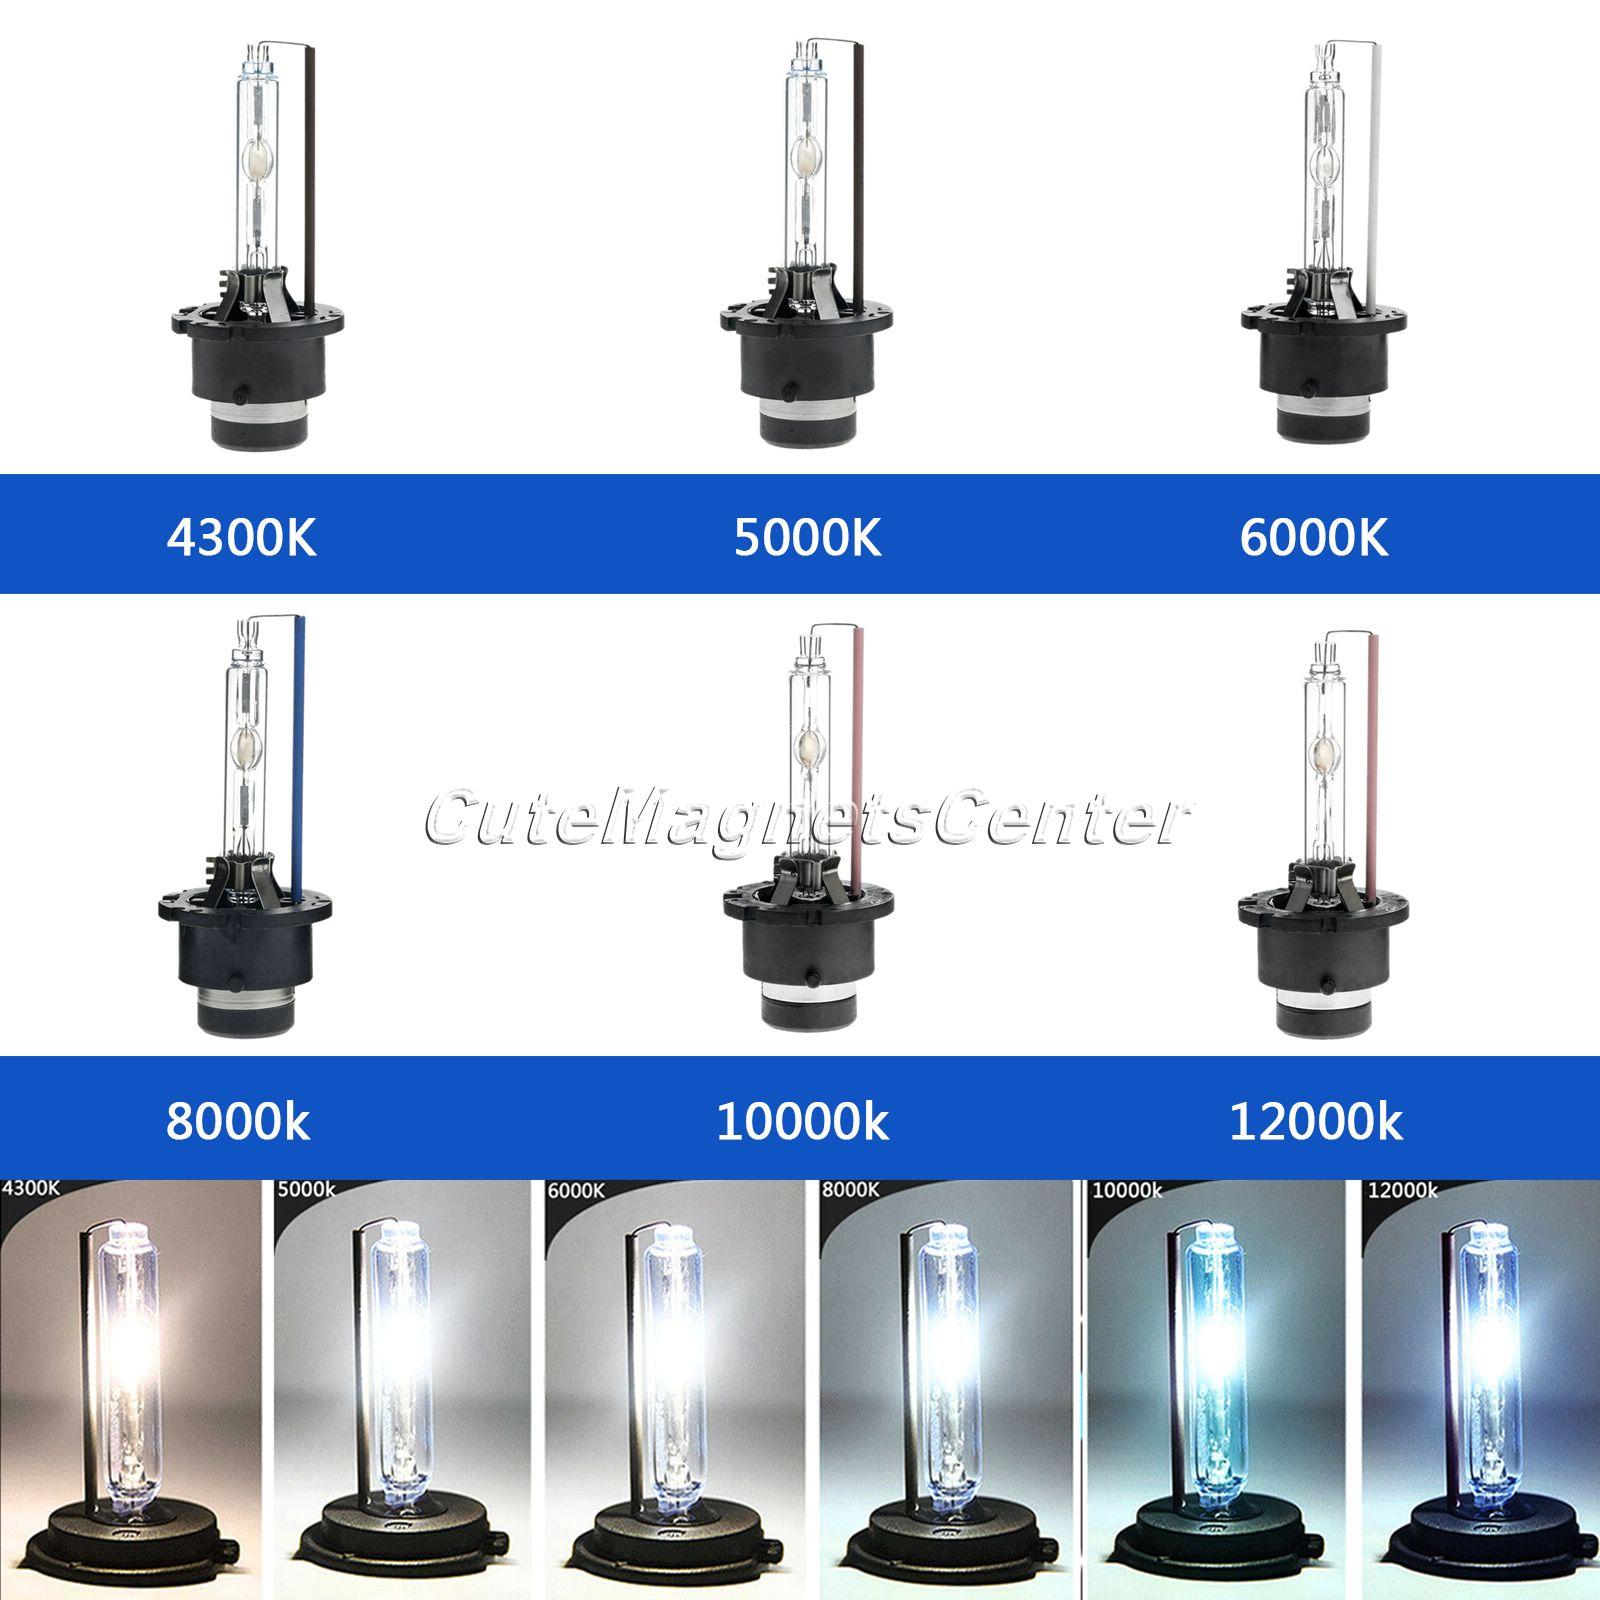 Car Light Source Car Single Beam Xenon HID Headlights Auto LED Car Lights Head Lamp Bulbs Source 4300K 5000K 6000K 8000K 12000K